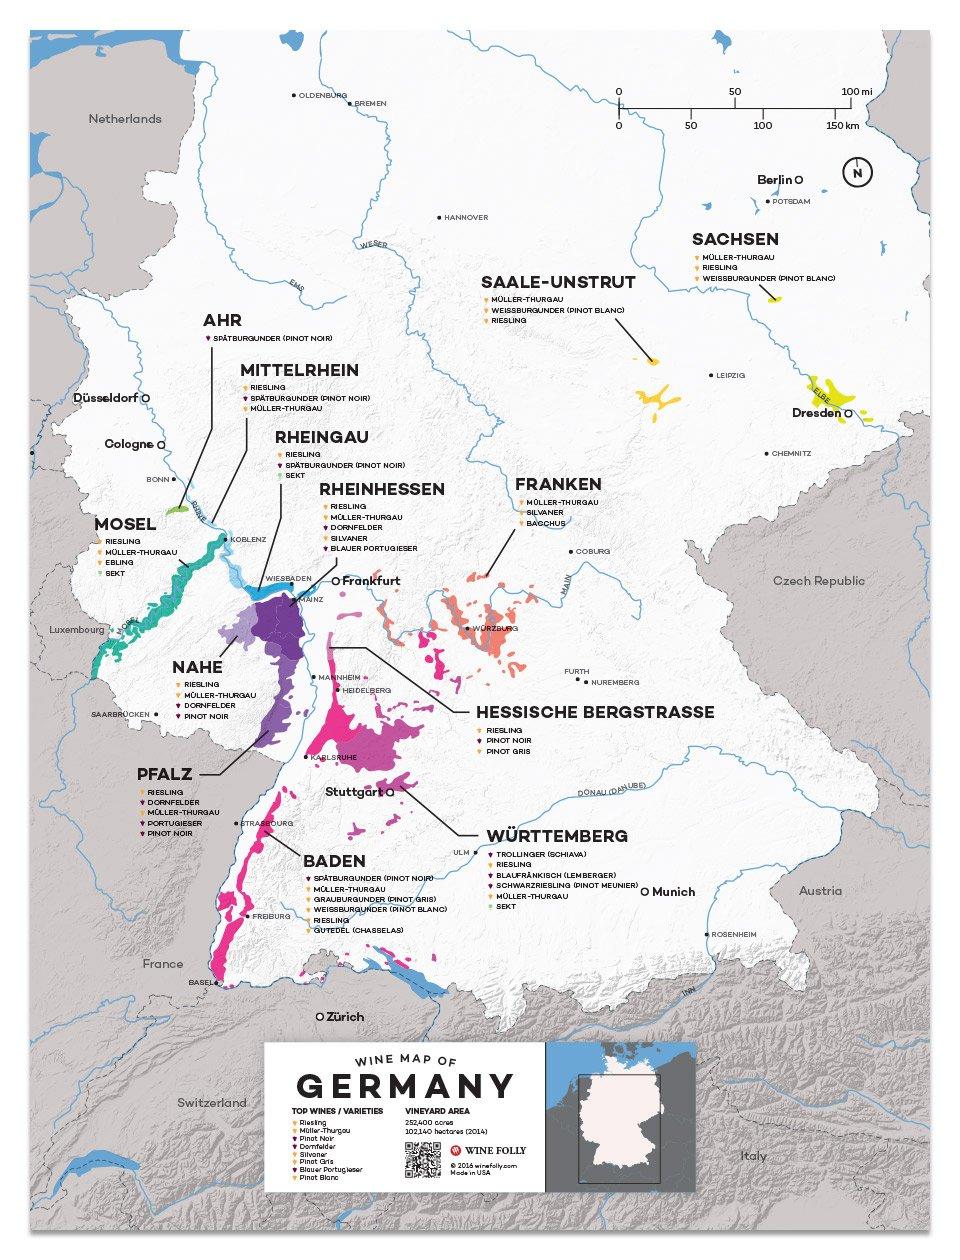 Regions Of Germany Map.German Wine Regions Map Via Winefolly Rockin Red Blog